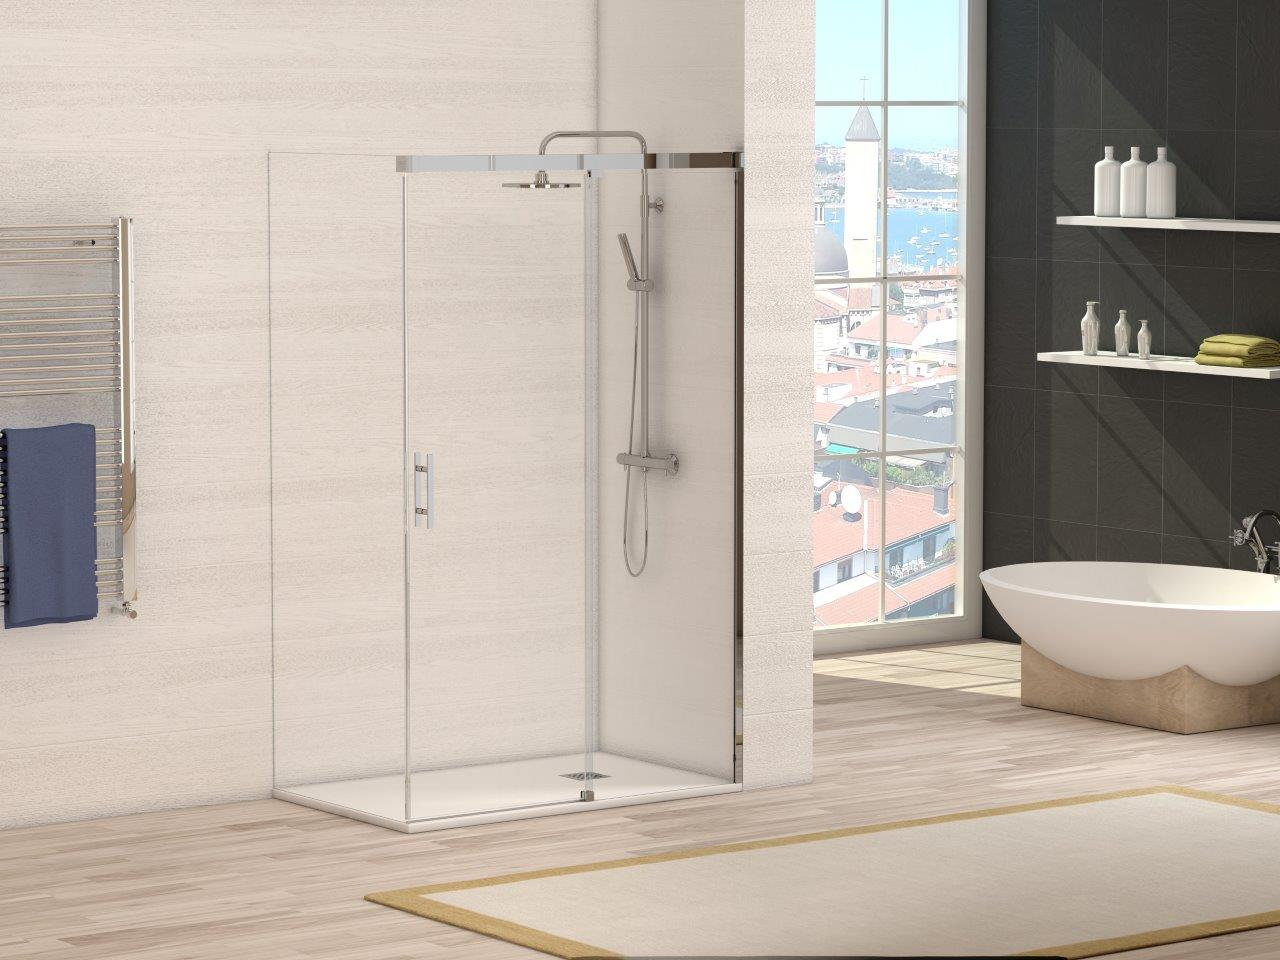 Mamparas de ducha para tu ba o - Mamparas para duchas fotos ...